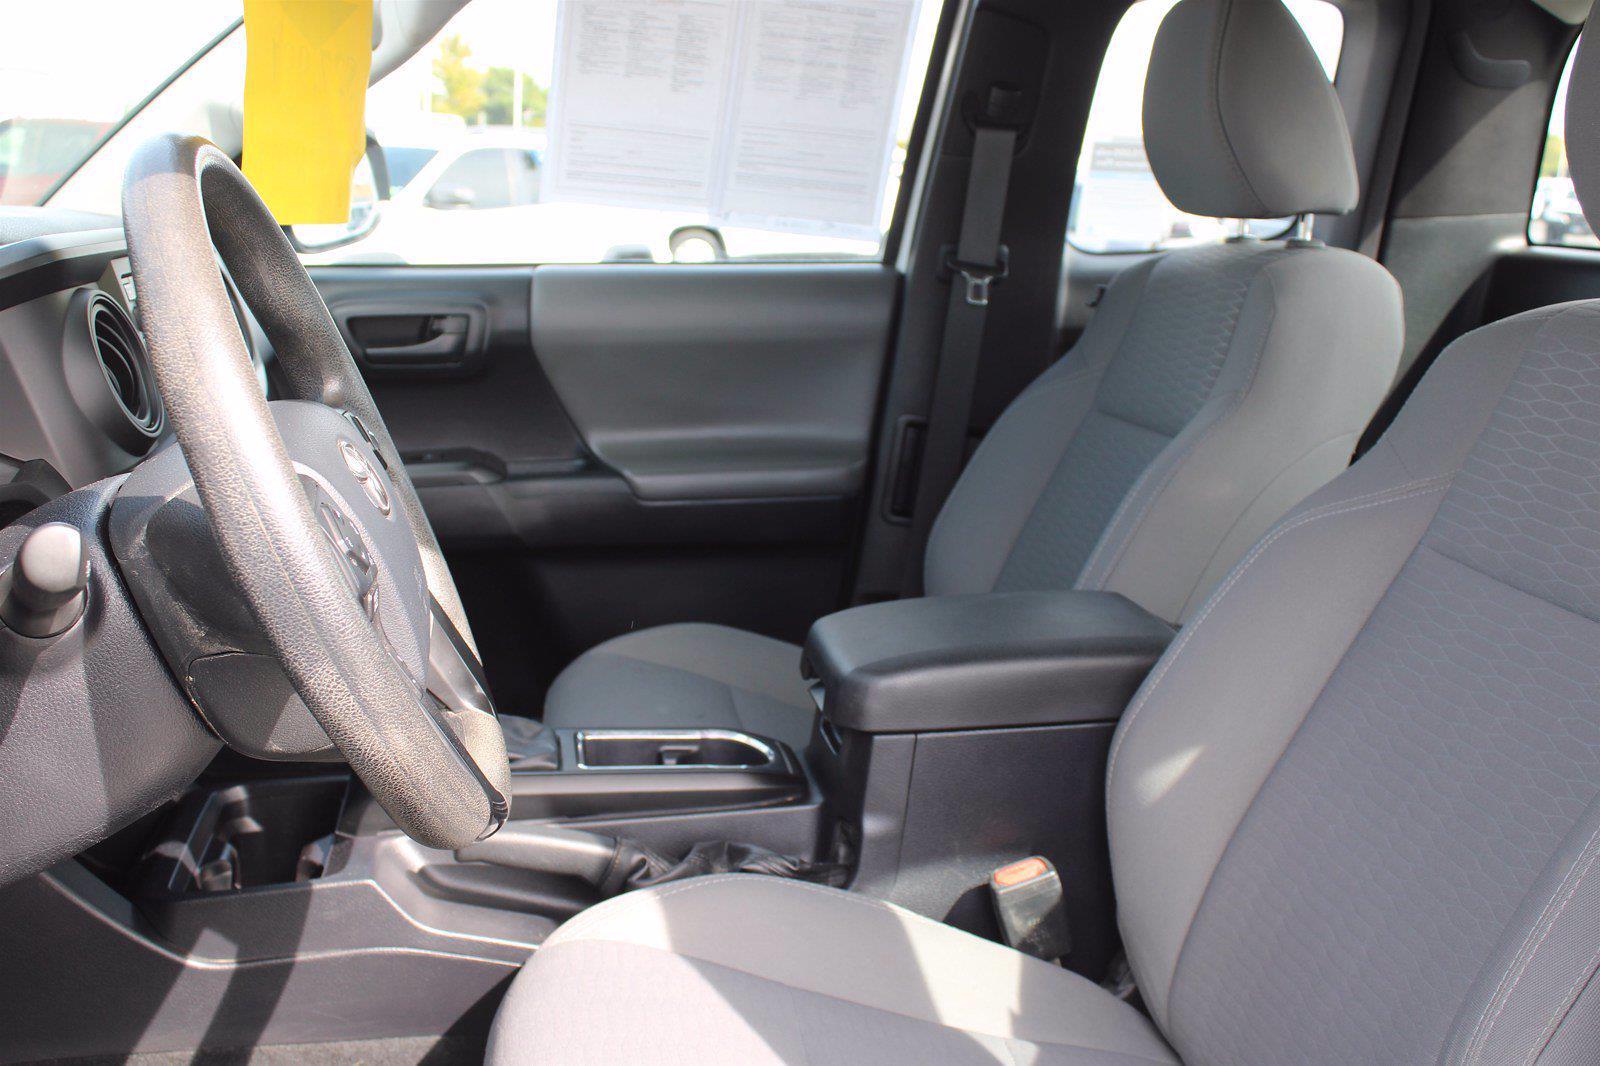 2018 Tacoma Extra Cab 4x2,  Pickup #DU90983 - photo 9